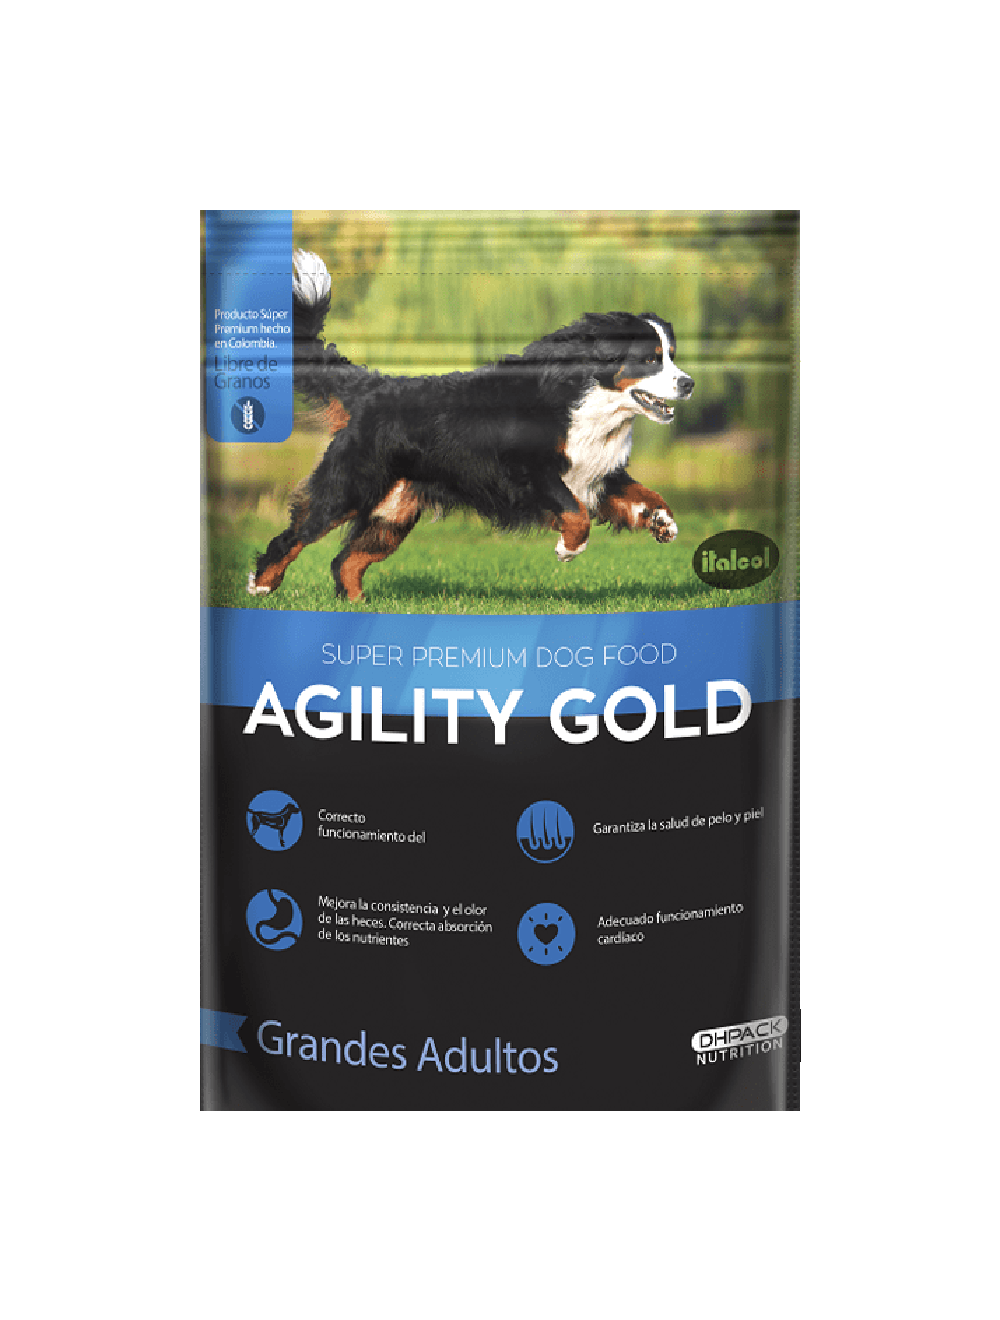 Agility Gold Grandes Adultos 15 Kg - Ciudaddemascotas.com